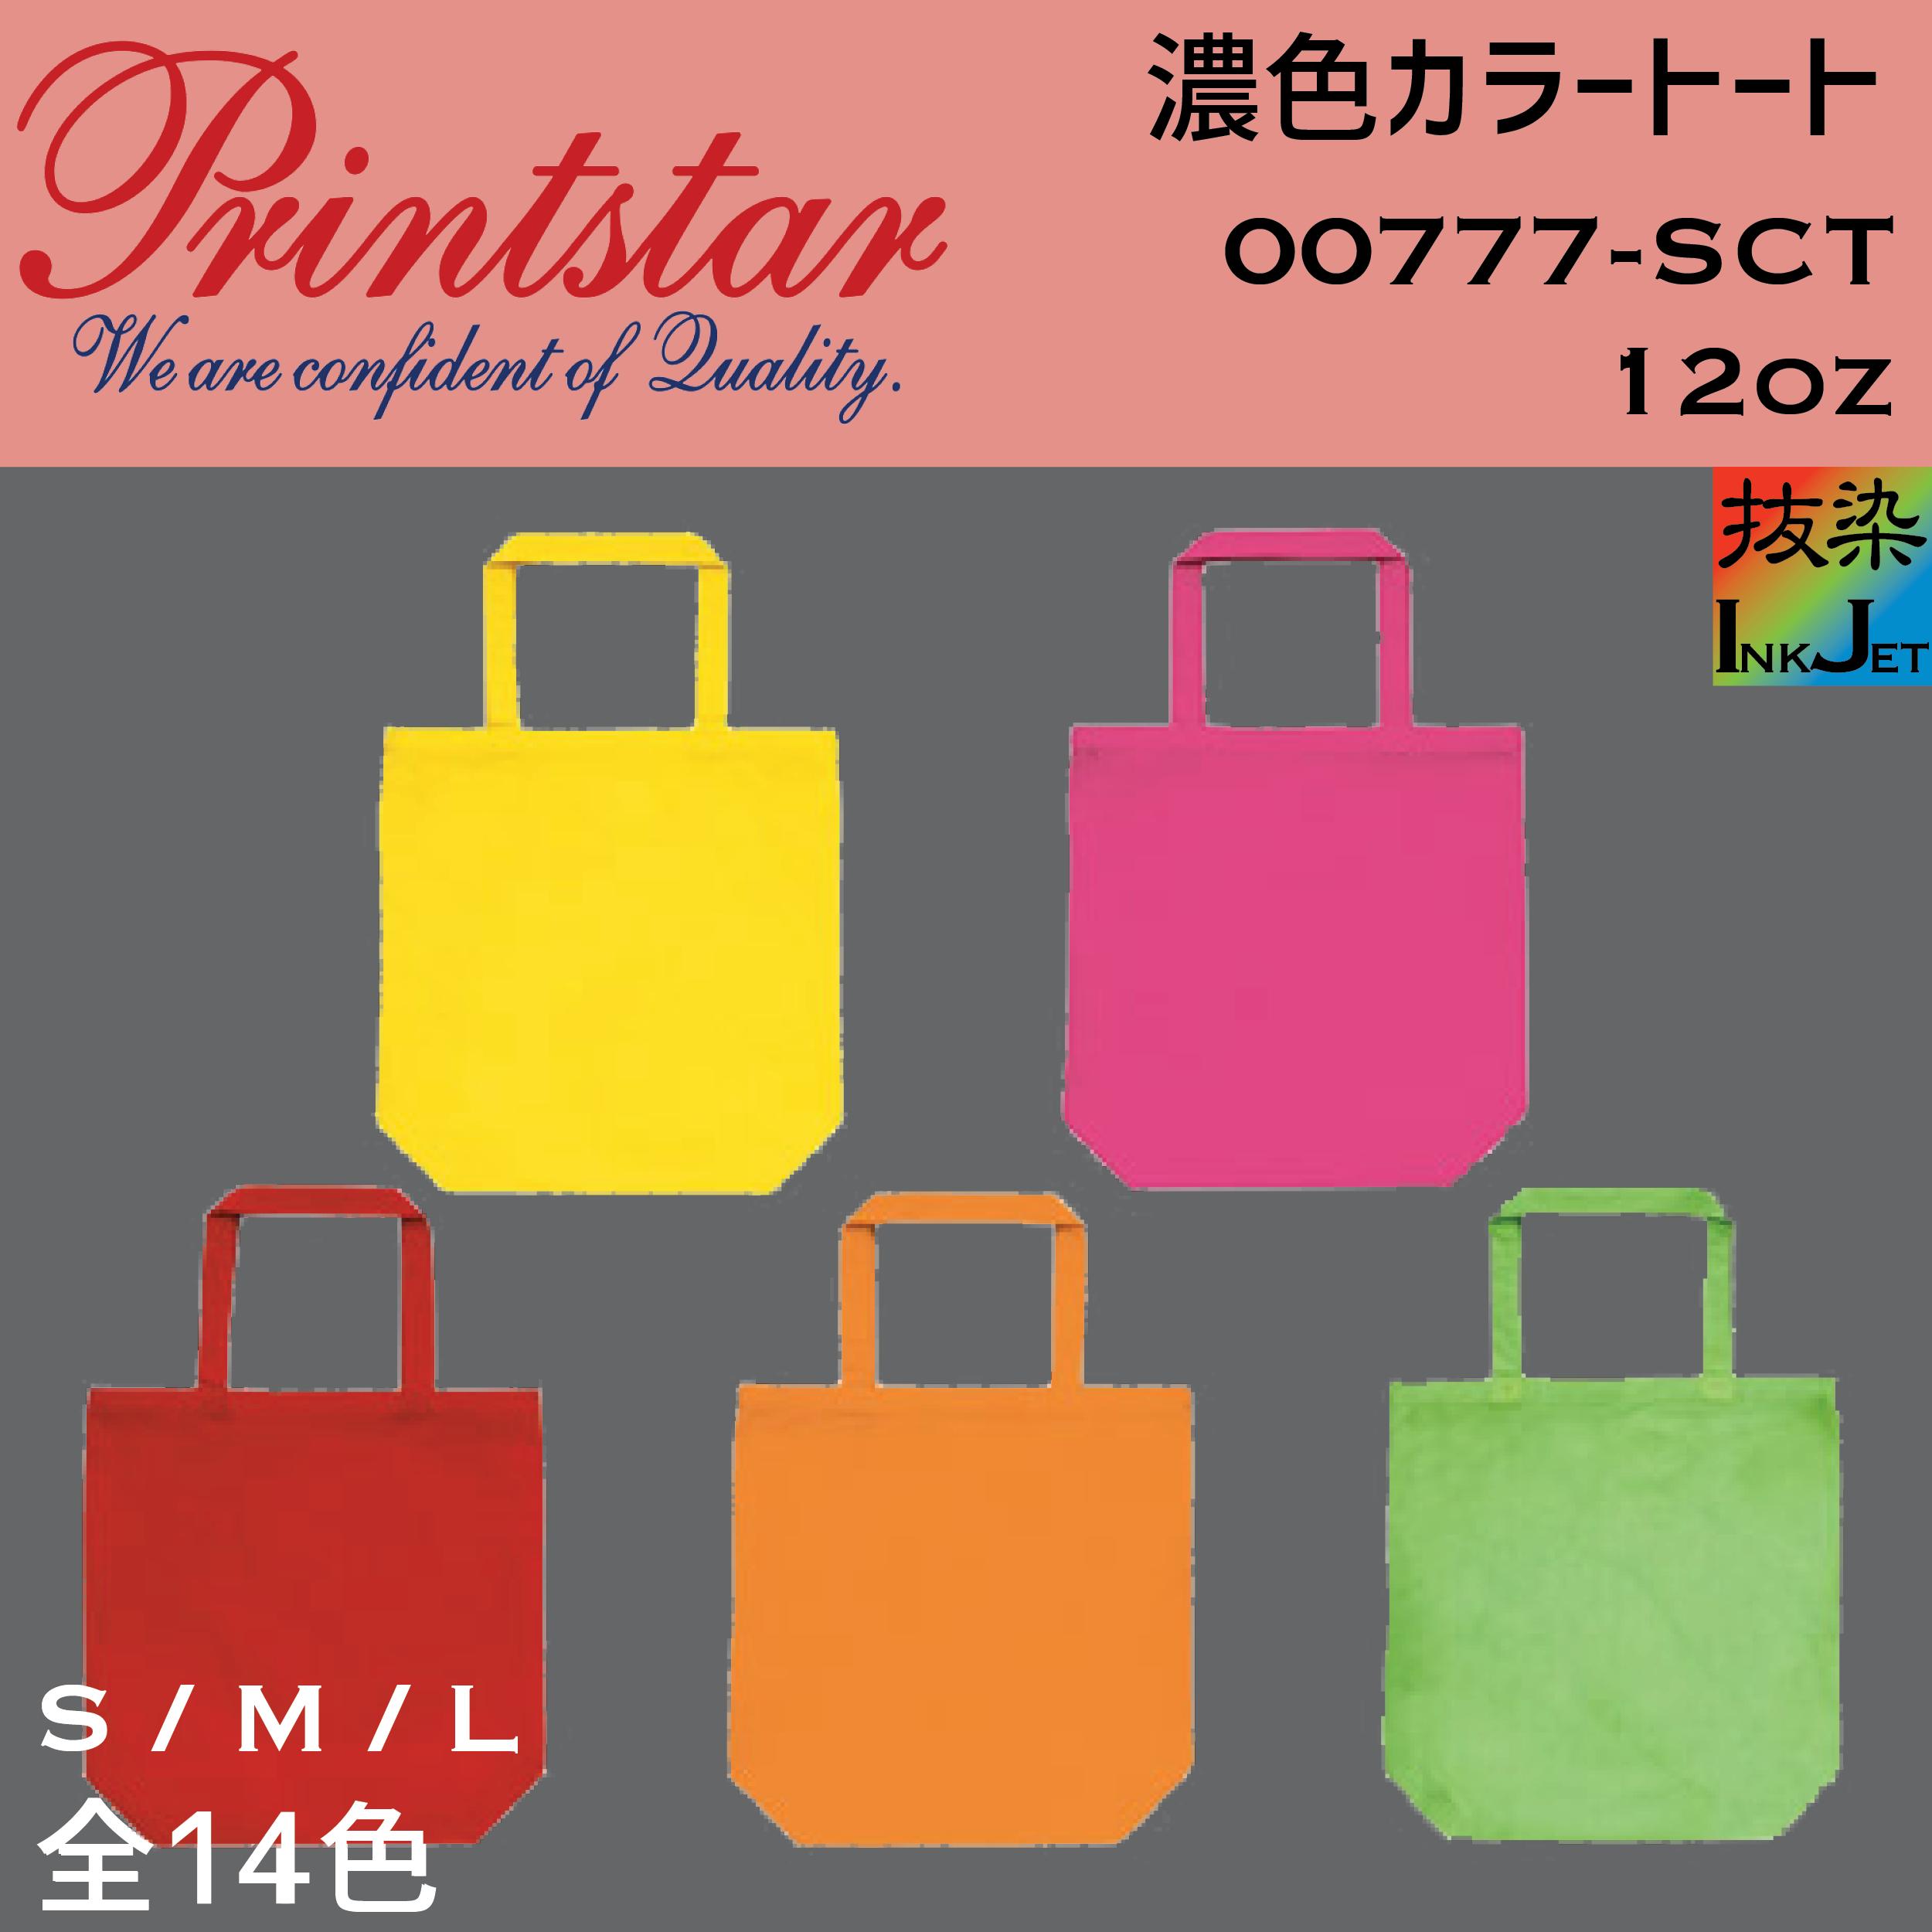 Printstar プリントスター 濃色カラートートバッグ(抜染プリント) 00777-SCT【本体+プリント代】